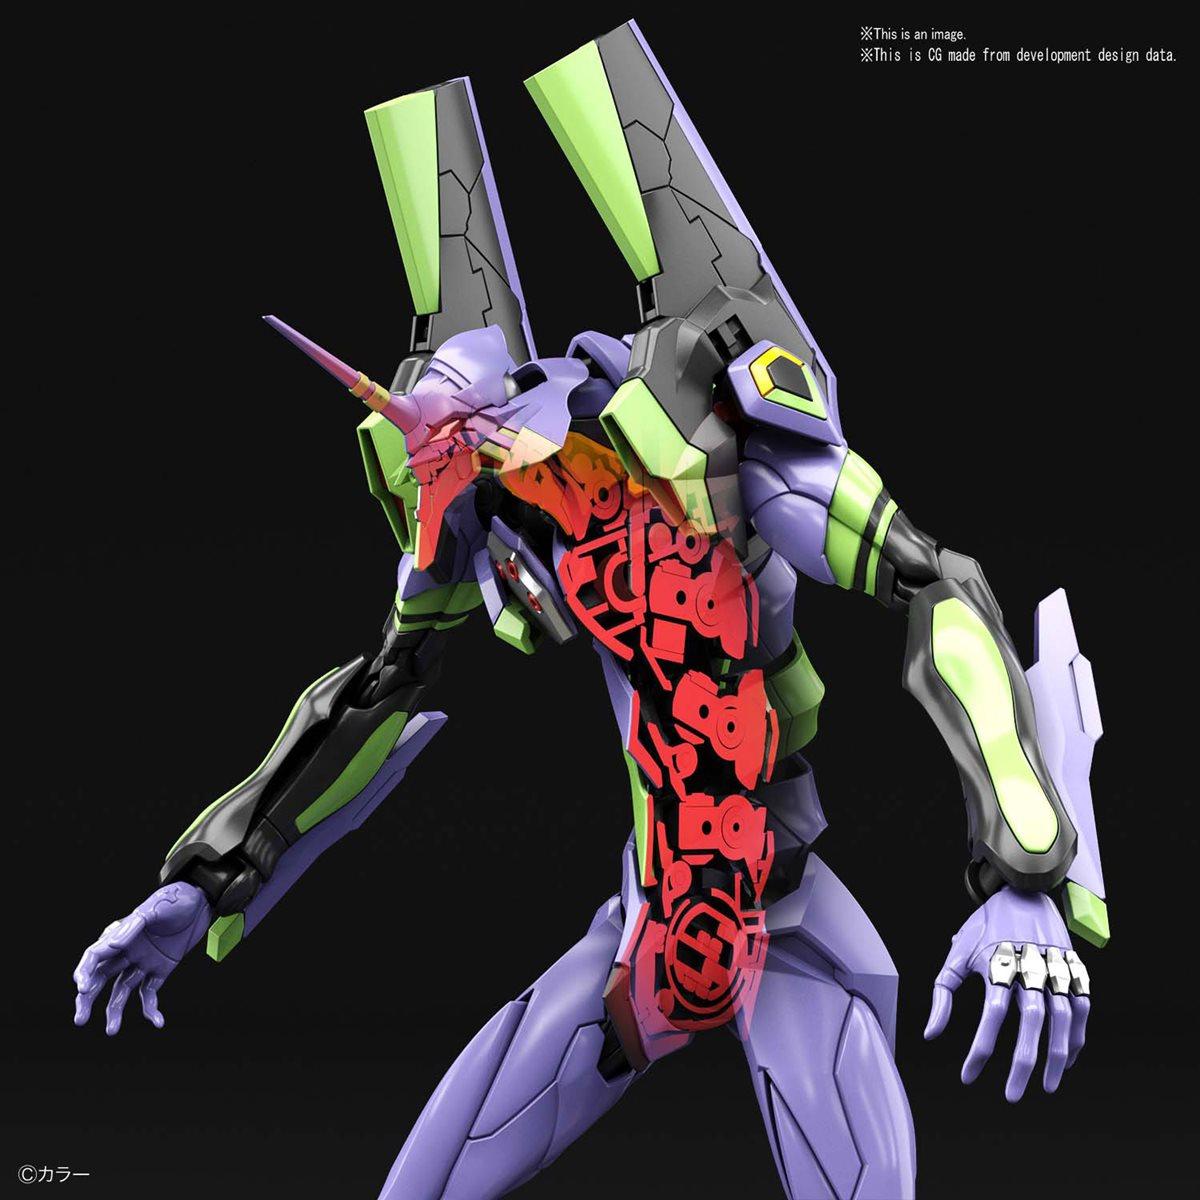 RG Bandai Evangelion Unit-01